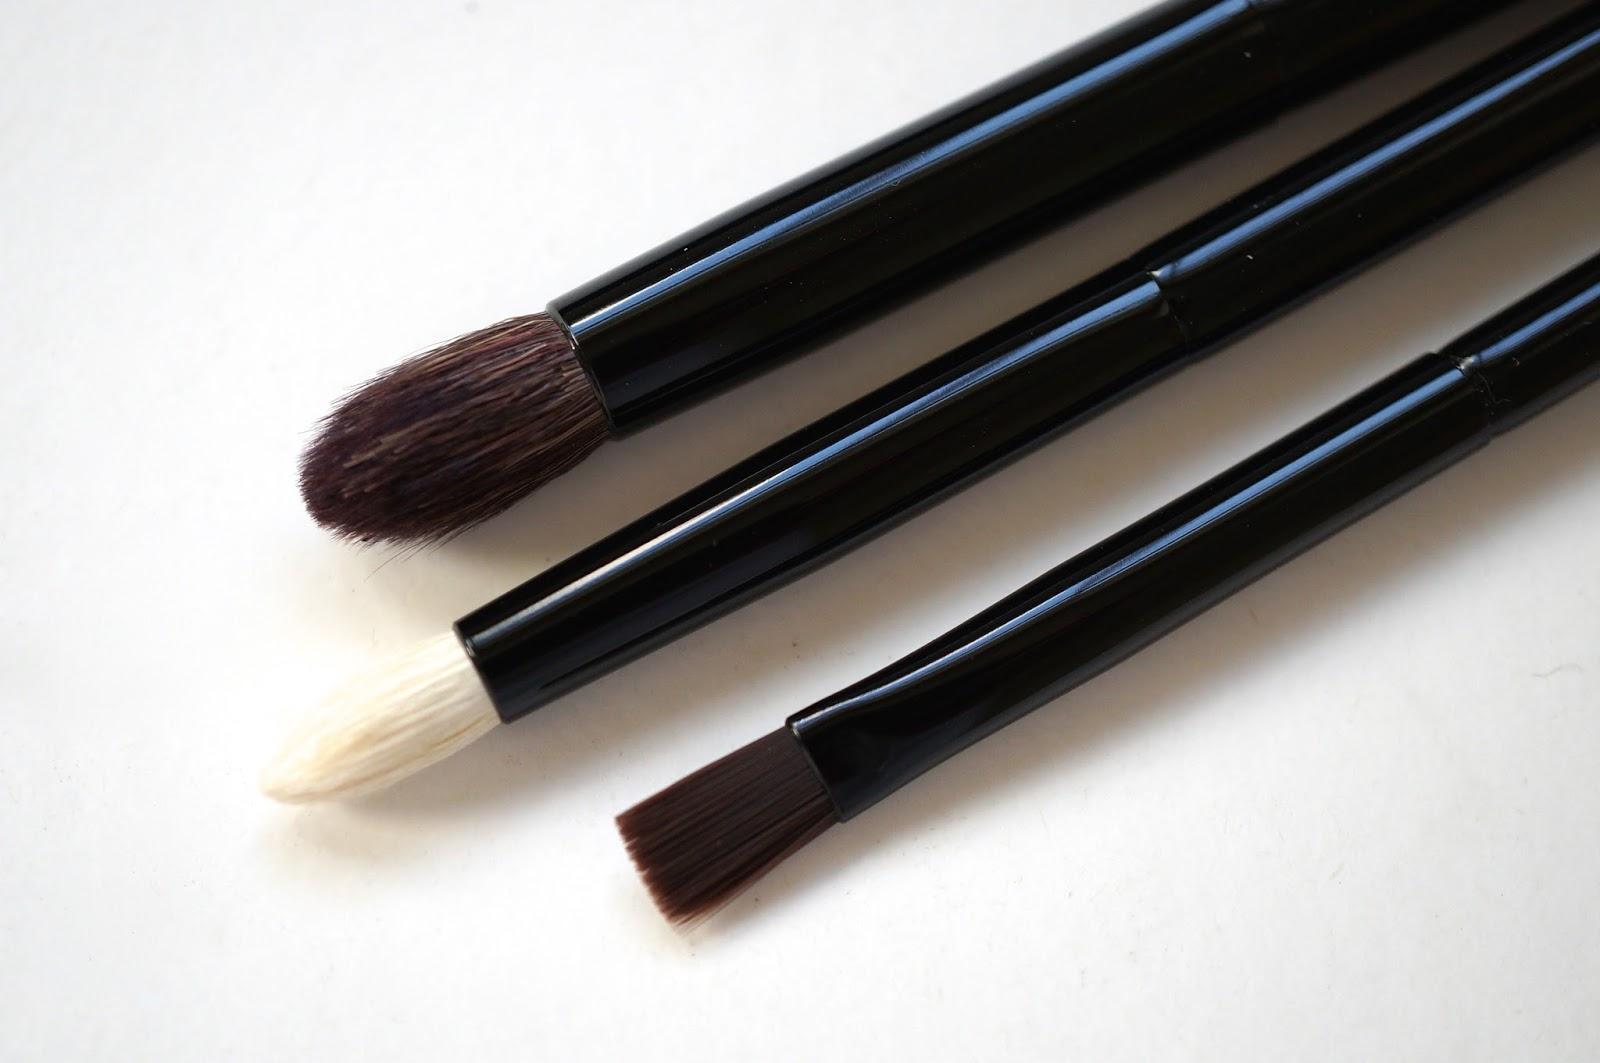 les mini de chanel essential mini brushes eva 39 s beautyblog. Black Bedroom Furniture Sets. Home Design Ideas